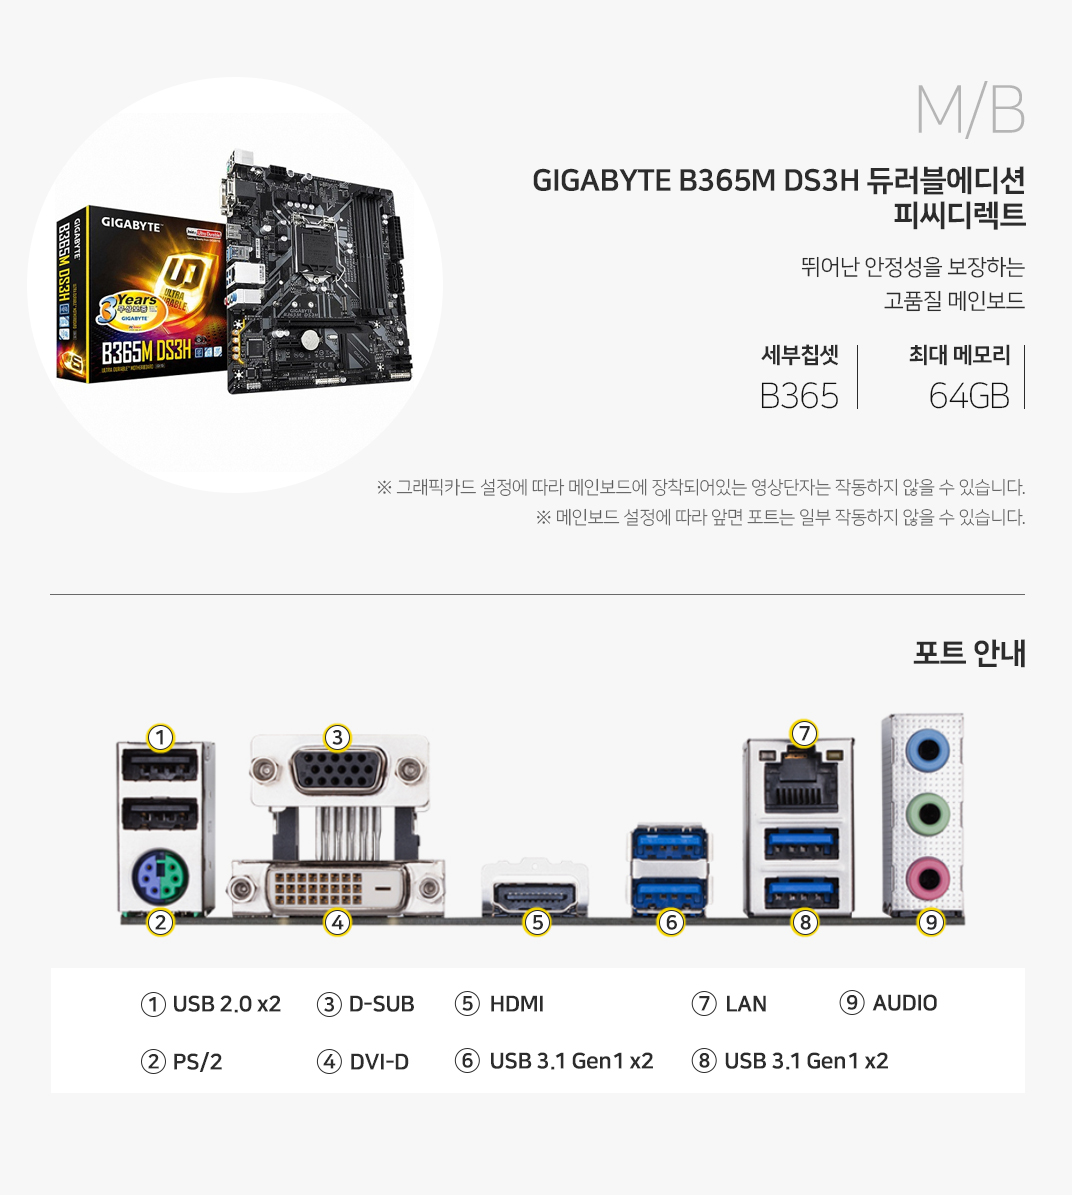 M/B GIGABYTE B365M DS3H 듀러블에디션 피씨디렉트 뛰어난 안정성을 보장하는 고품질 메인보드 세부칩셋 B365 최대메모리 64GB 그래픽 설정에 따라 메인보드에 장착되어 있는 영상단자는 작동하지 않을 수 있습니다. 메인보드 설정에 따라 앞면 포트는 일부 작동하지 않을 수 있습니다.